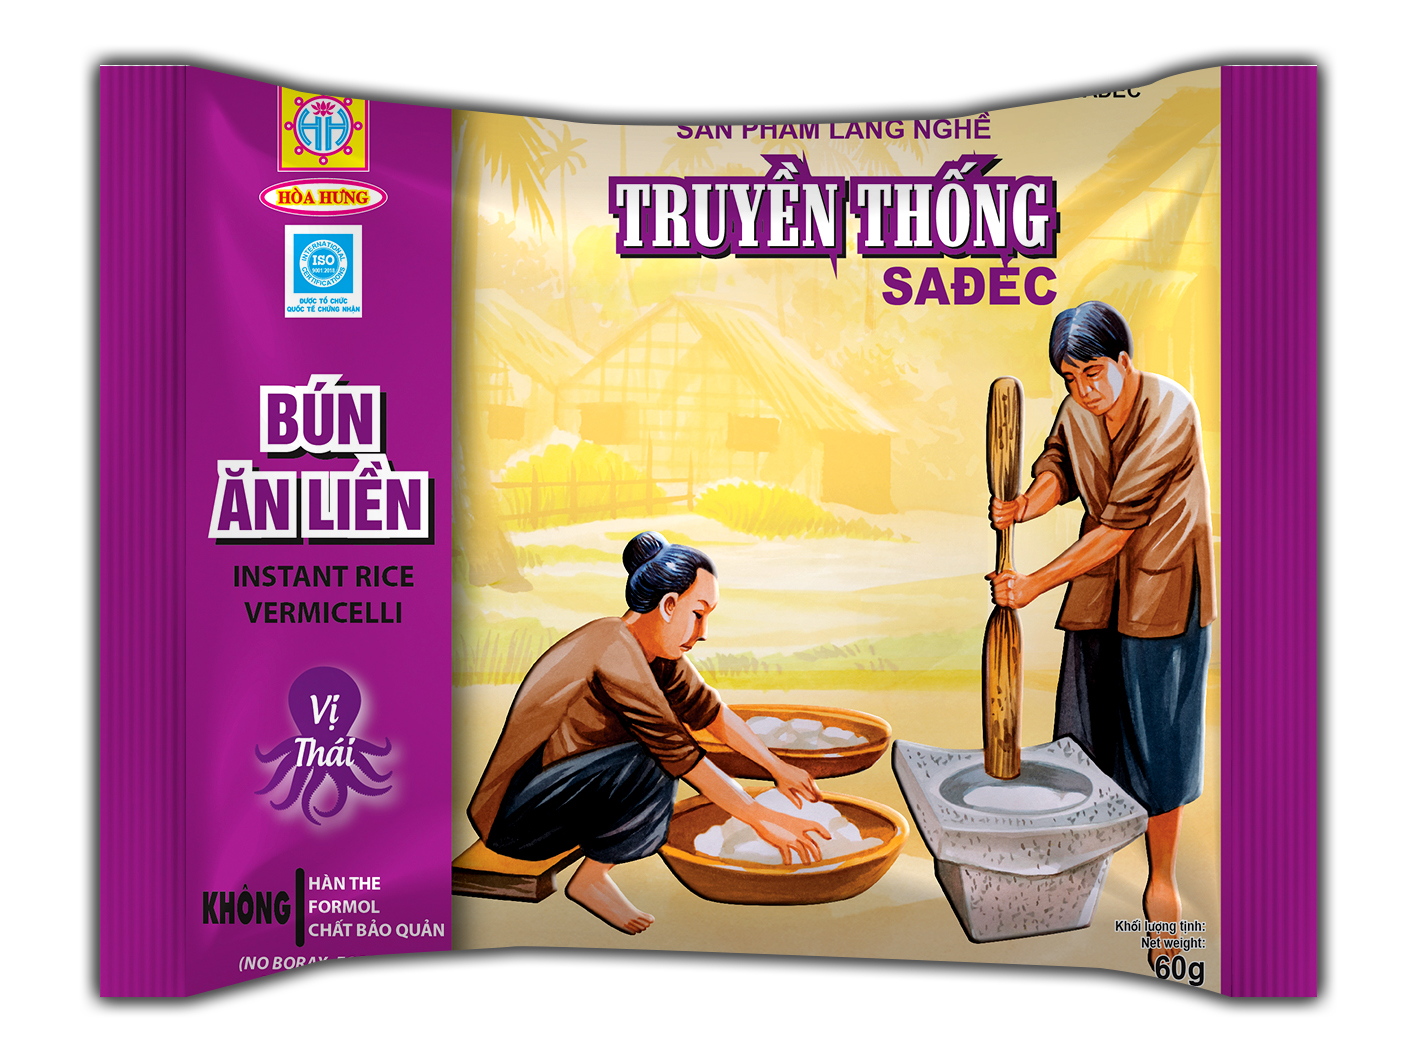 Noodles with Thai flavor